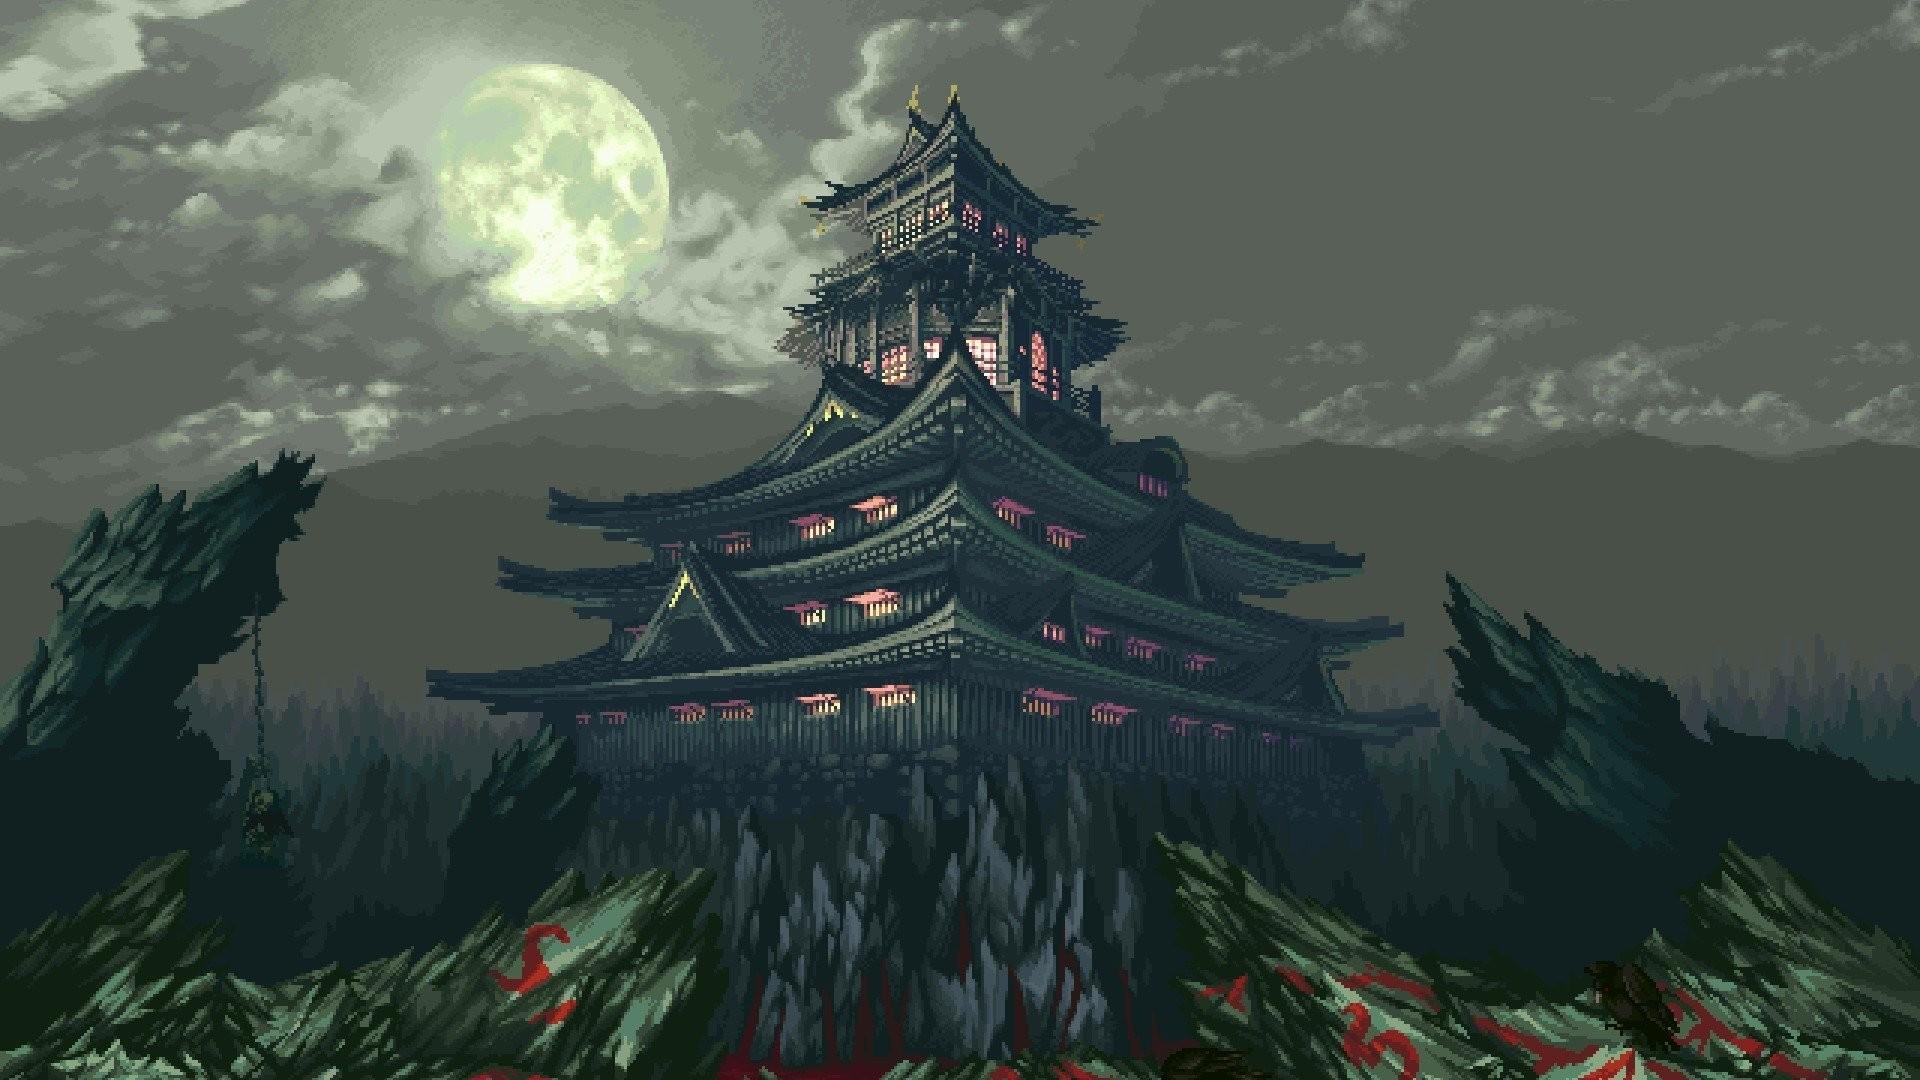 temple rock light moon clouds mountain 8-bit